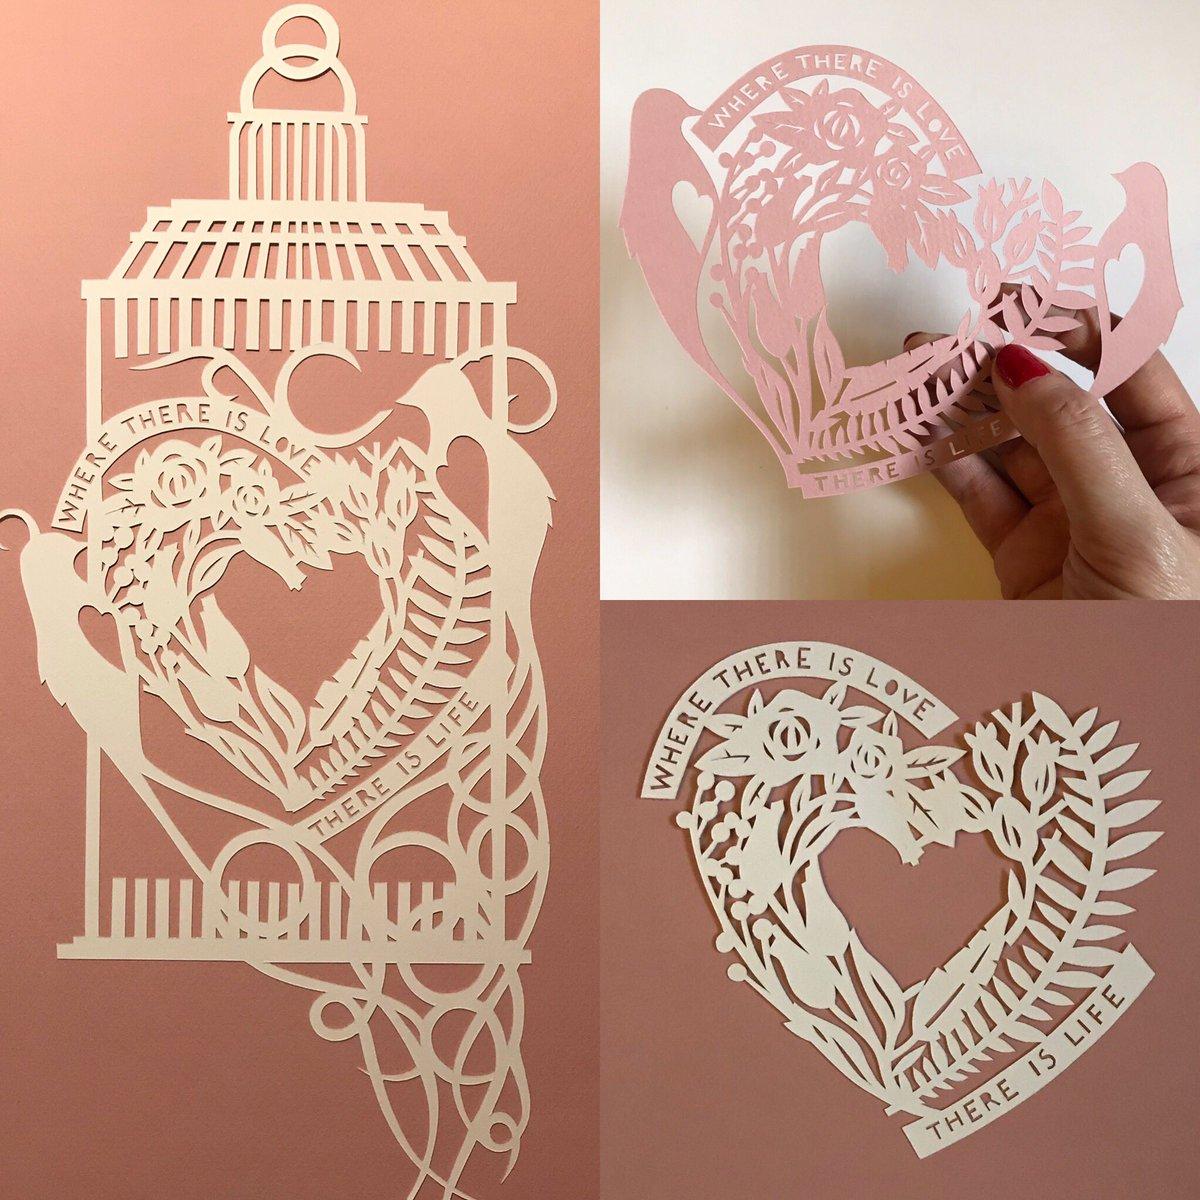 Happy Valentines Day ♥️ #paper #paperart #papercraft #papercut #valentines #lovebirds #love #heart #pink #art #artist #design #designers #etsy #etsyshop #EtsySeller